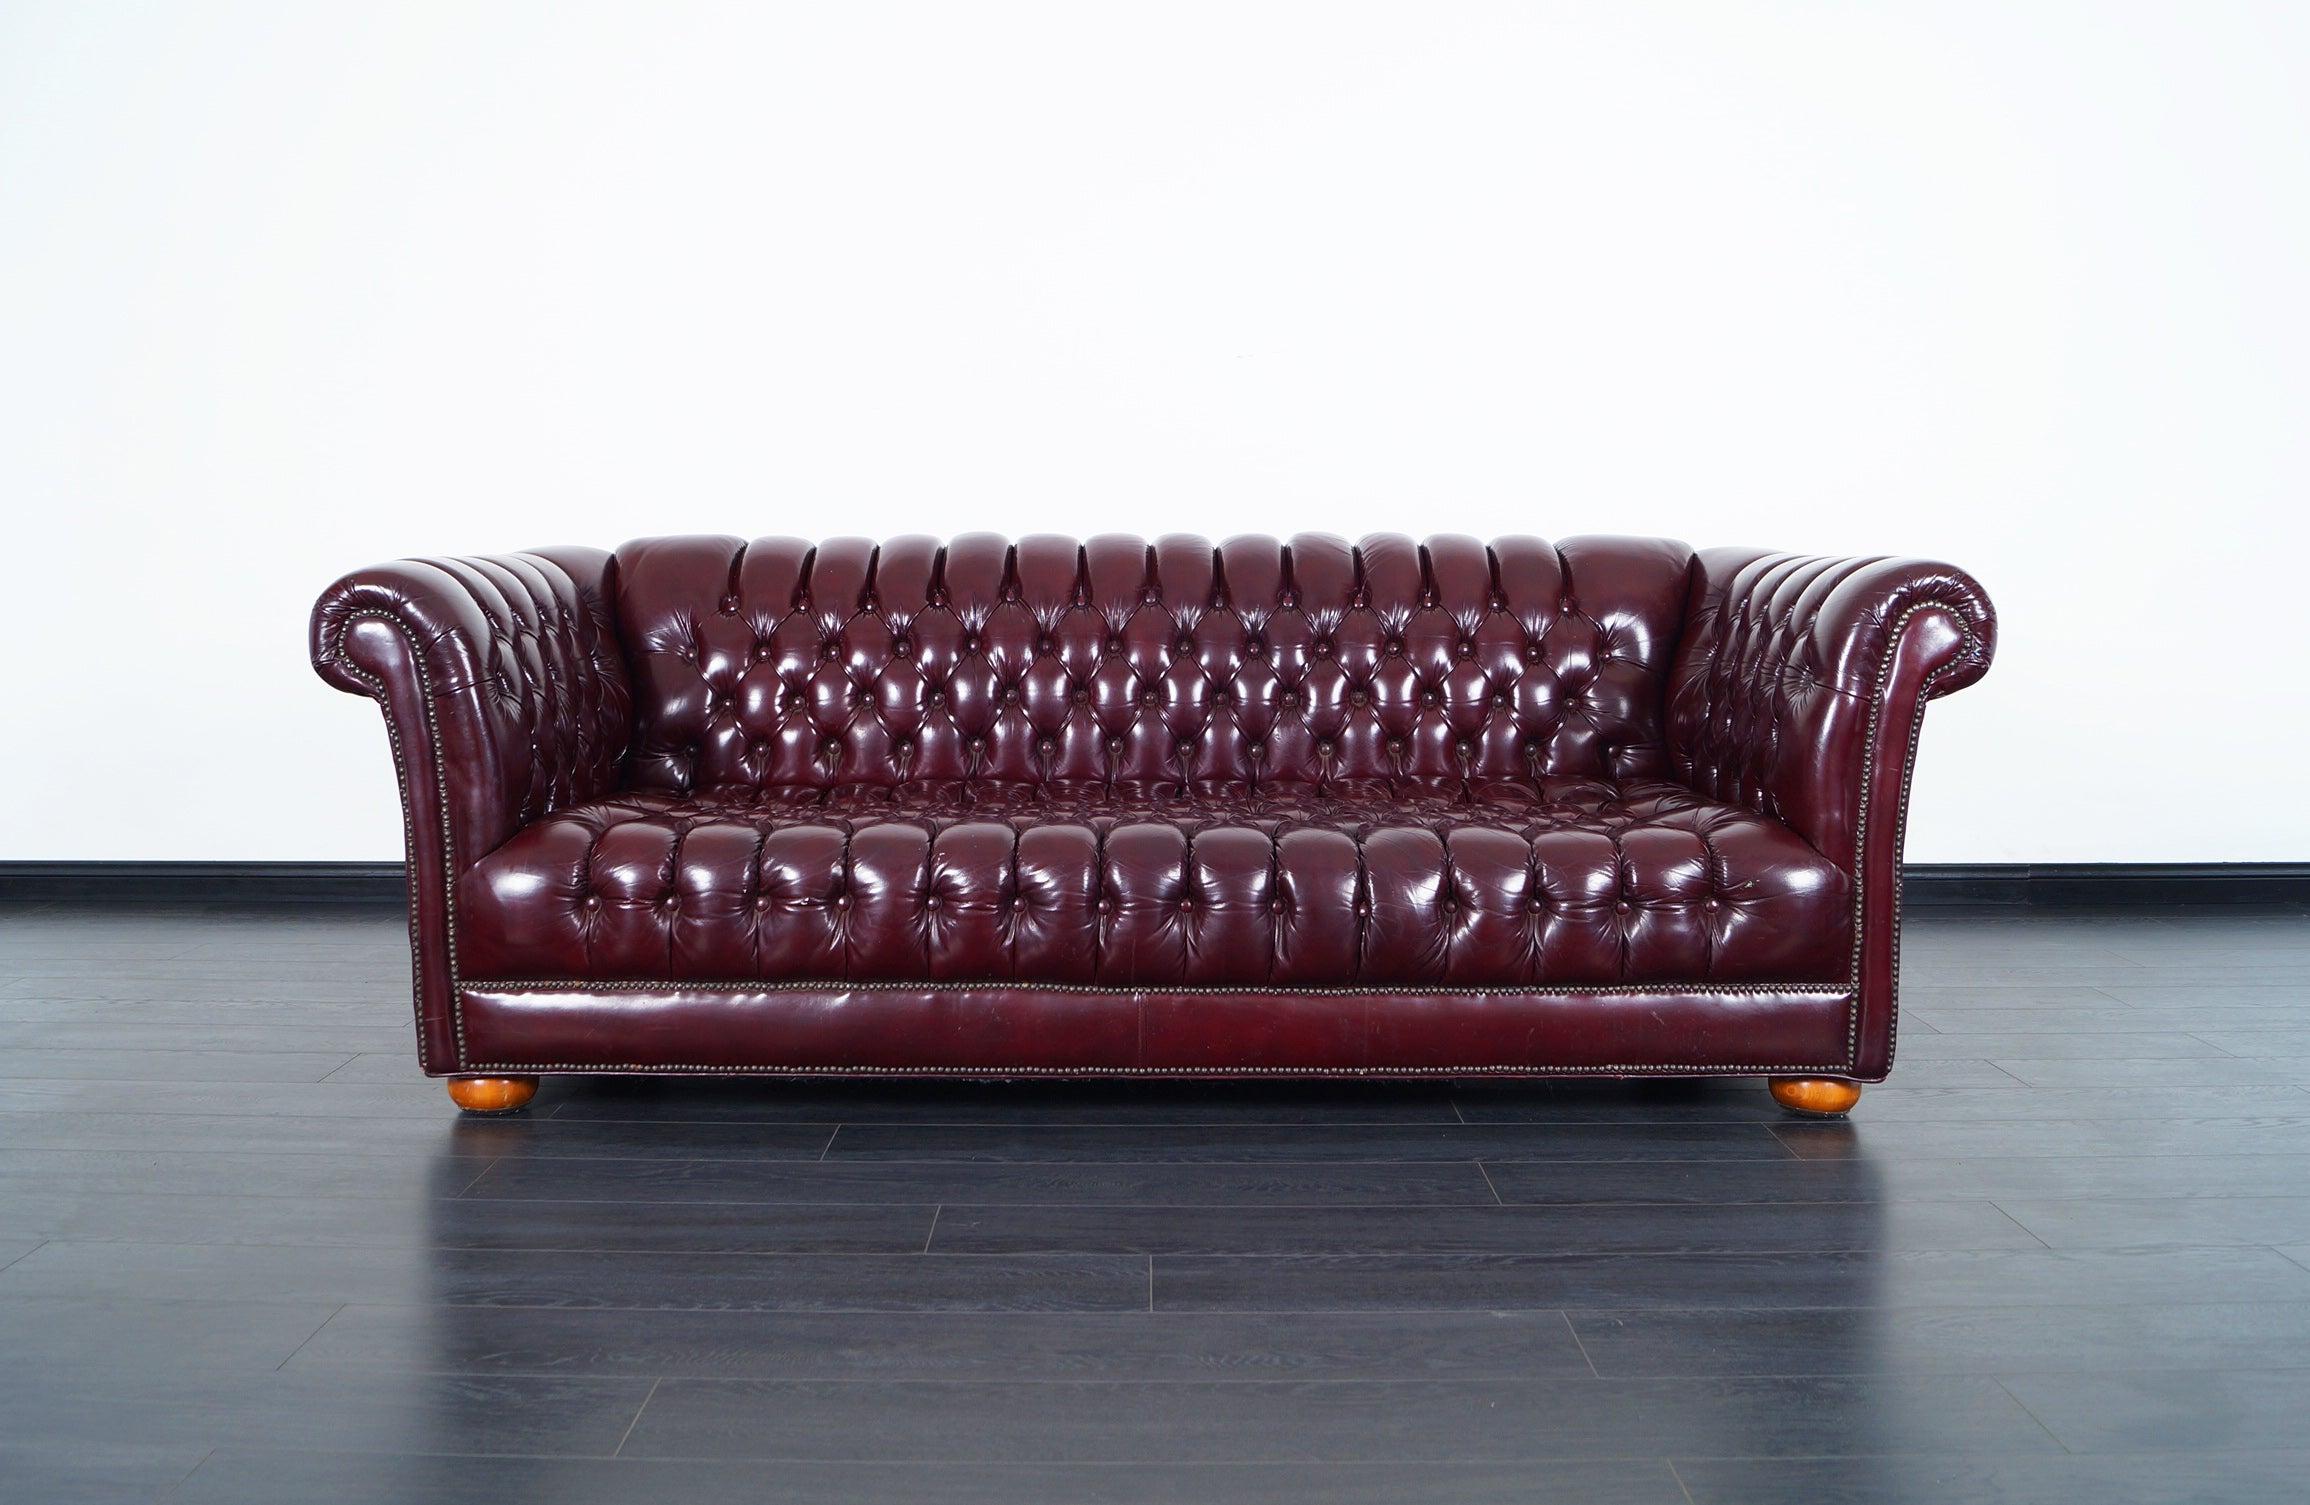 - Chesterfield Sofa And Loveseat – Caseconrad.com